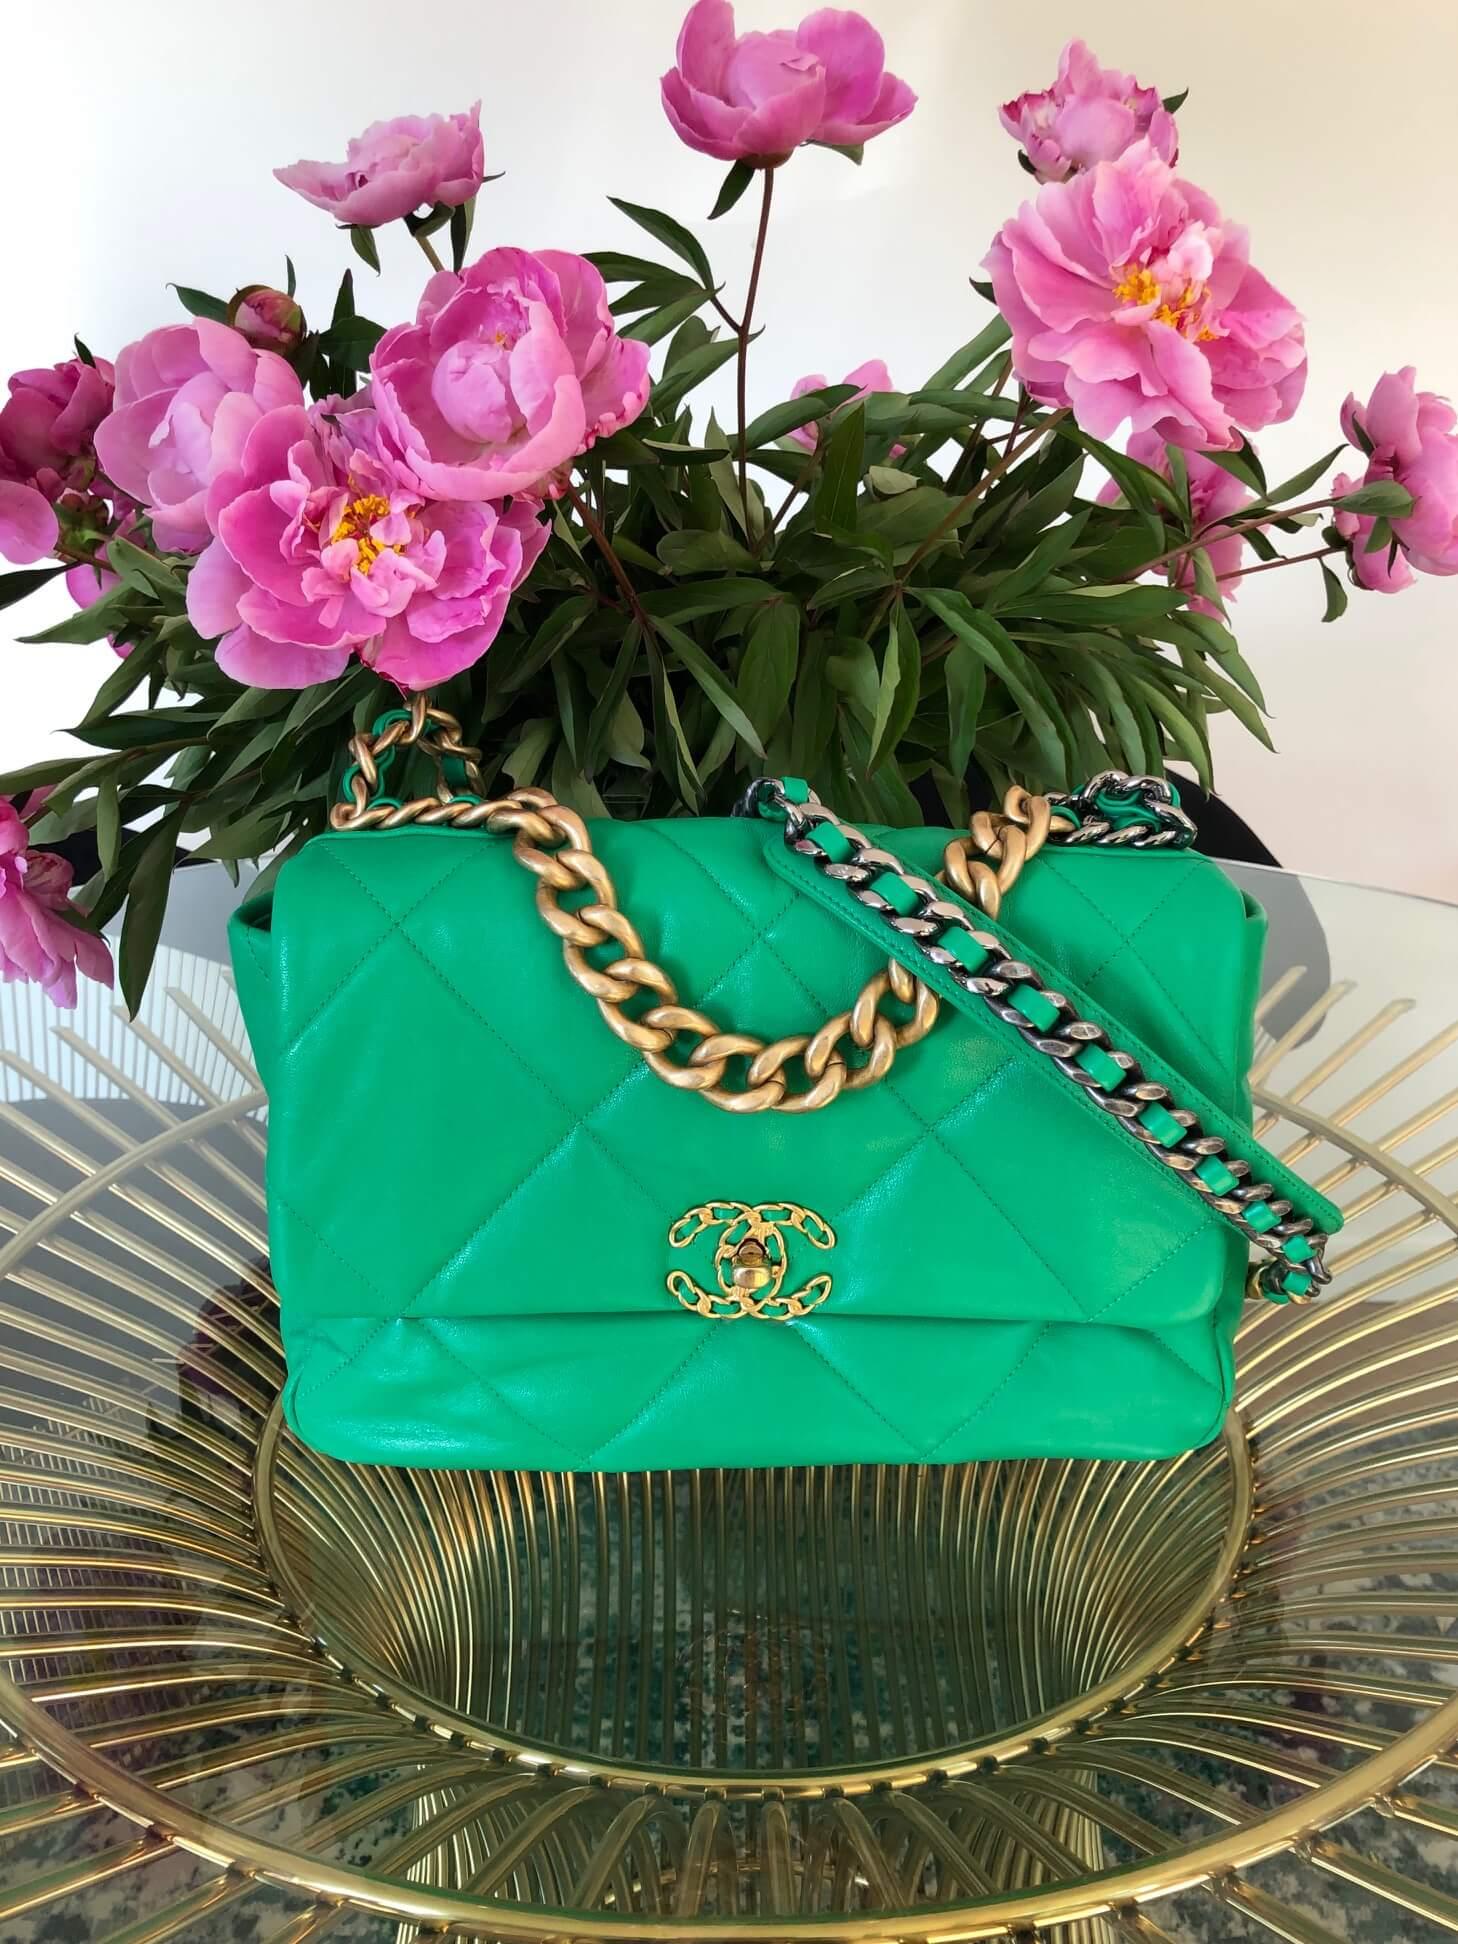 Bag CHANEL 19 Large Flap Green Lambskin Gold Ruthenium Hardware